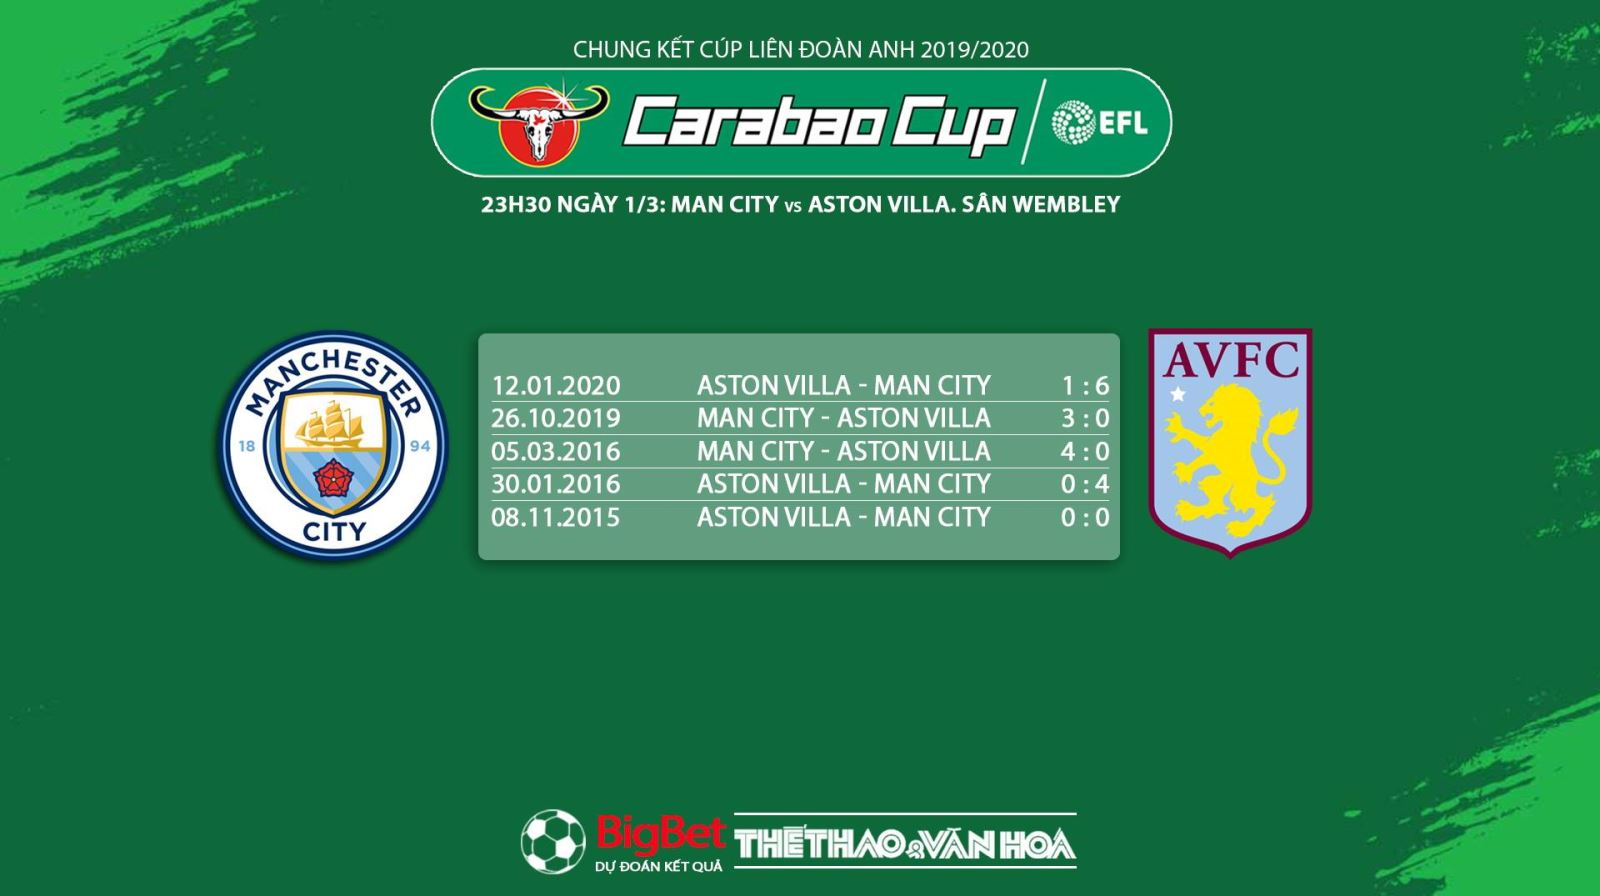 Aston Villa vs Man City, Aston Villa, Man City, trực tiếp Aston Villa vs Man City, soi kèo Aston Villa vs Man City, dự đoán Aston Villa vs Man City, nhận định Aston Villa vs Man City, lịch thi đấu bóng đá